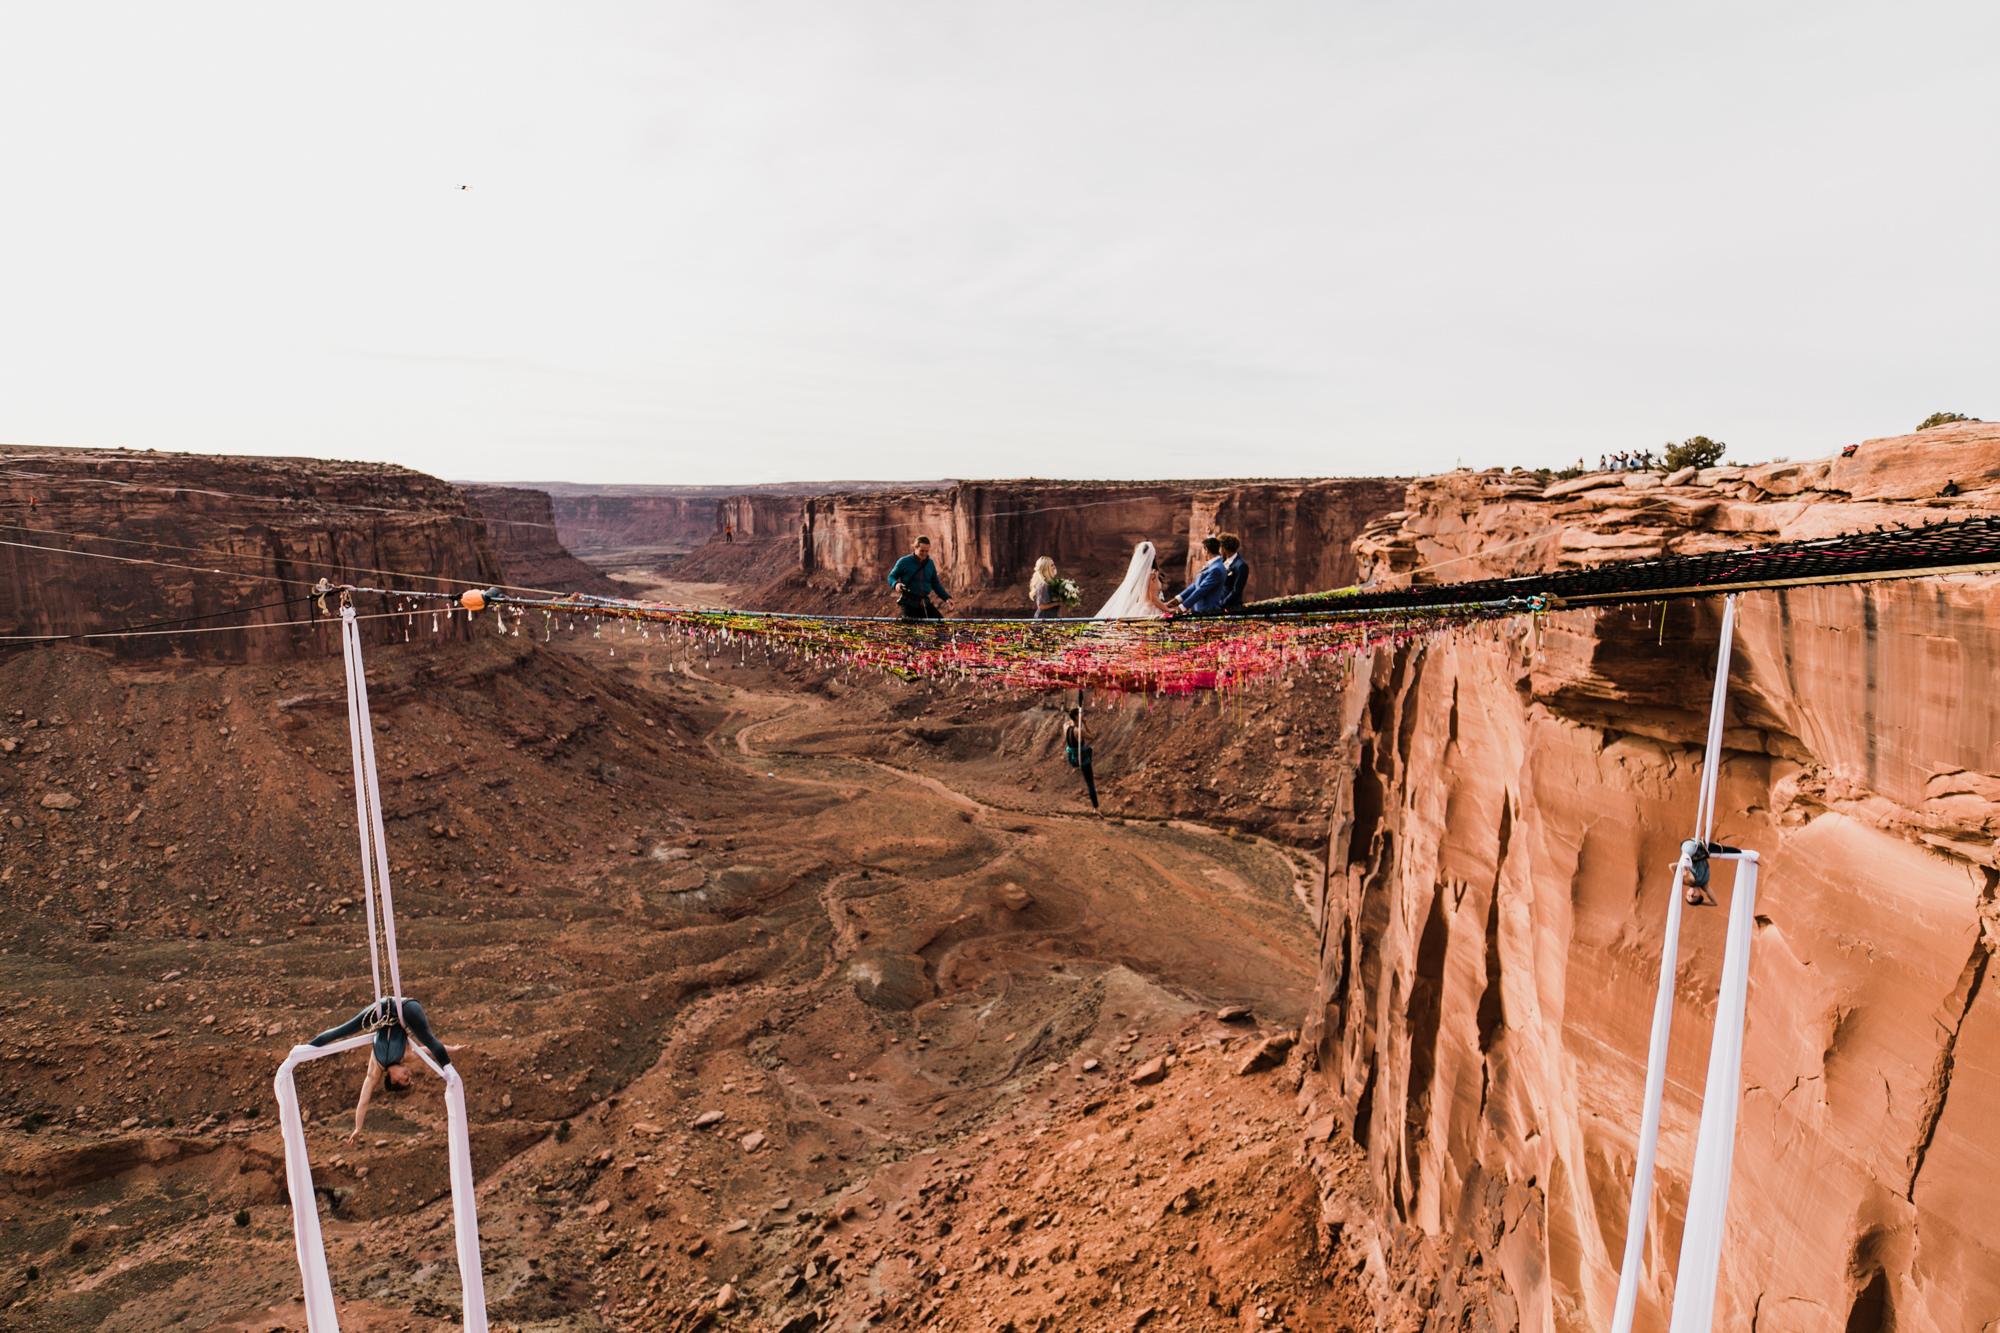 moab-canyon-spacenet-wedding-elopement-photographer-27.jpg